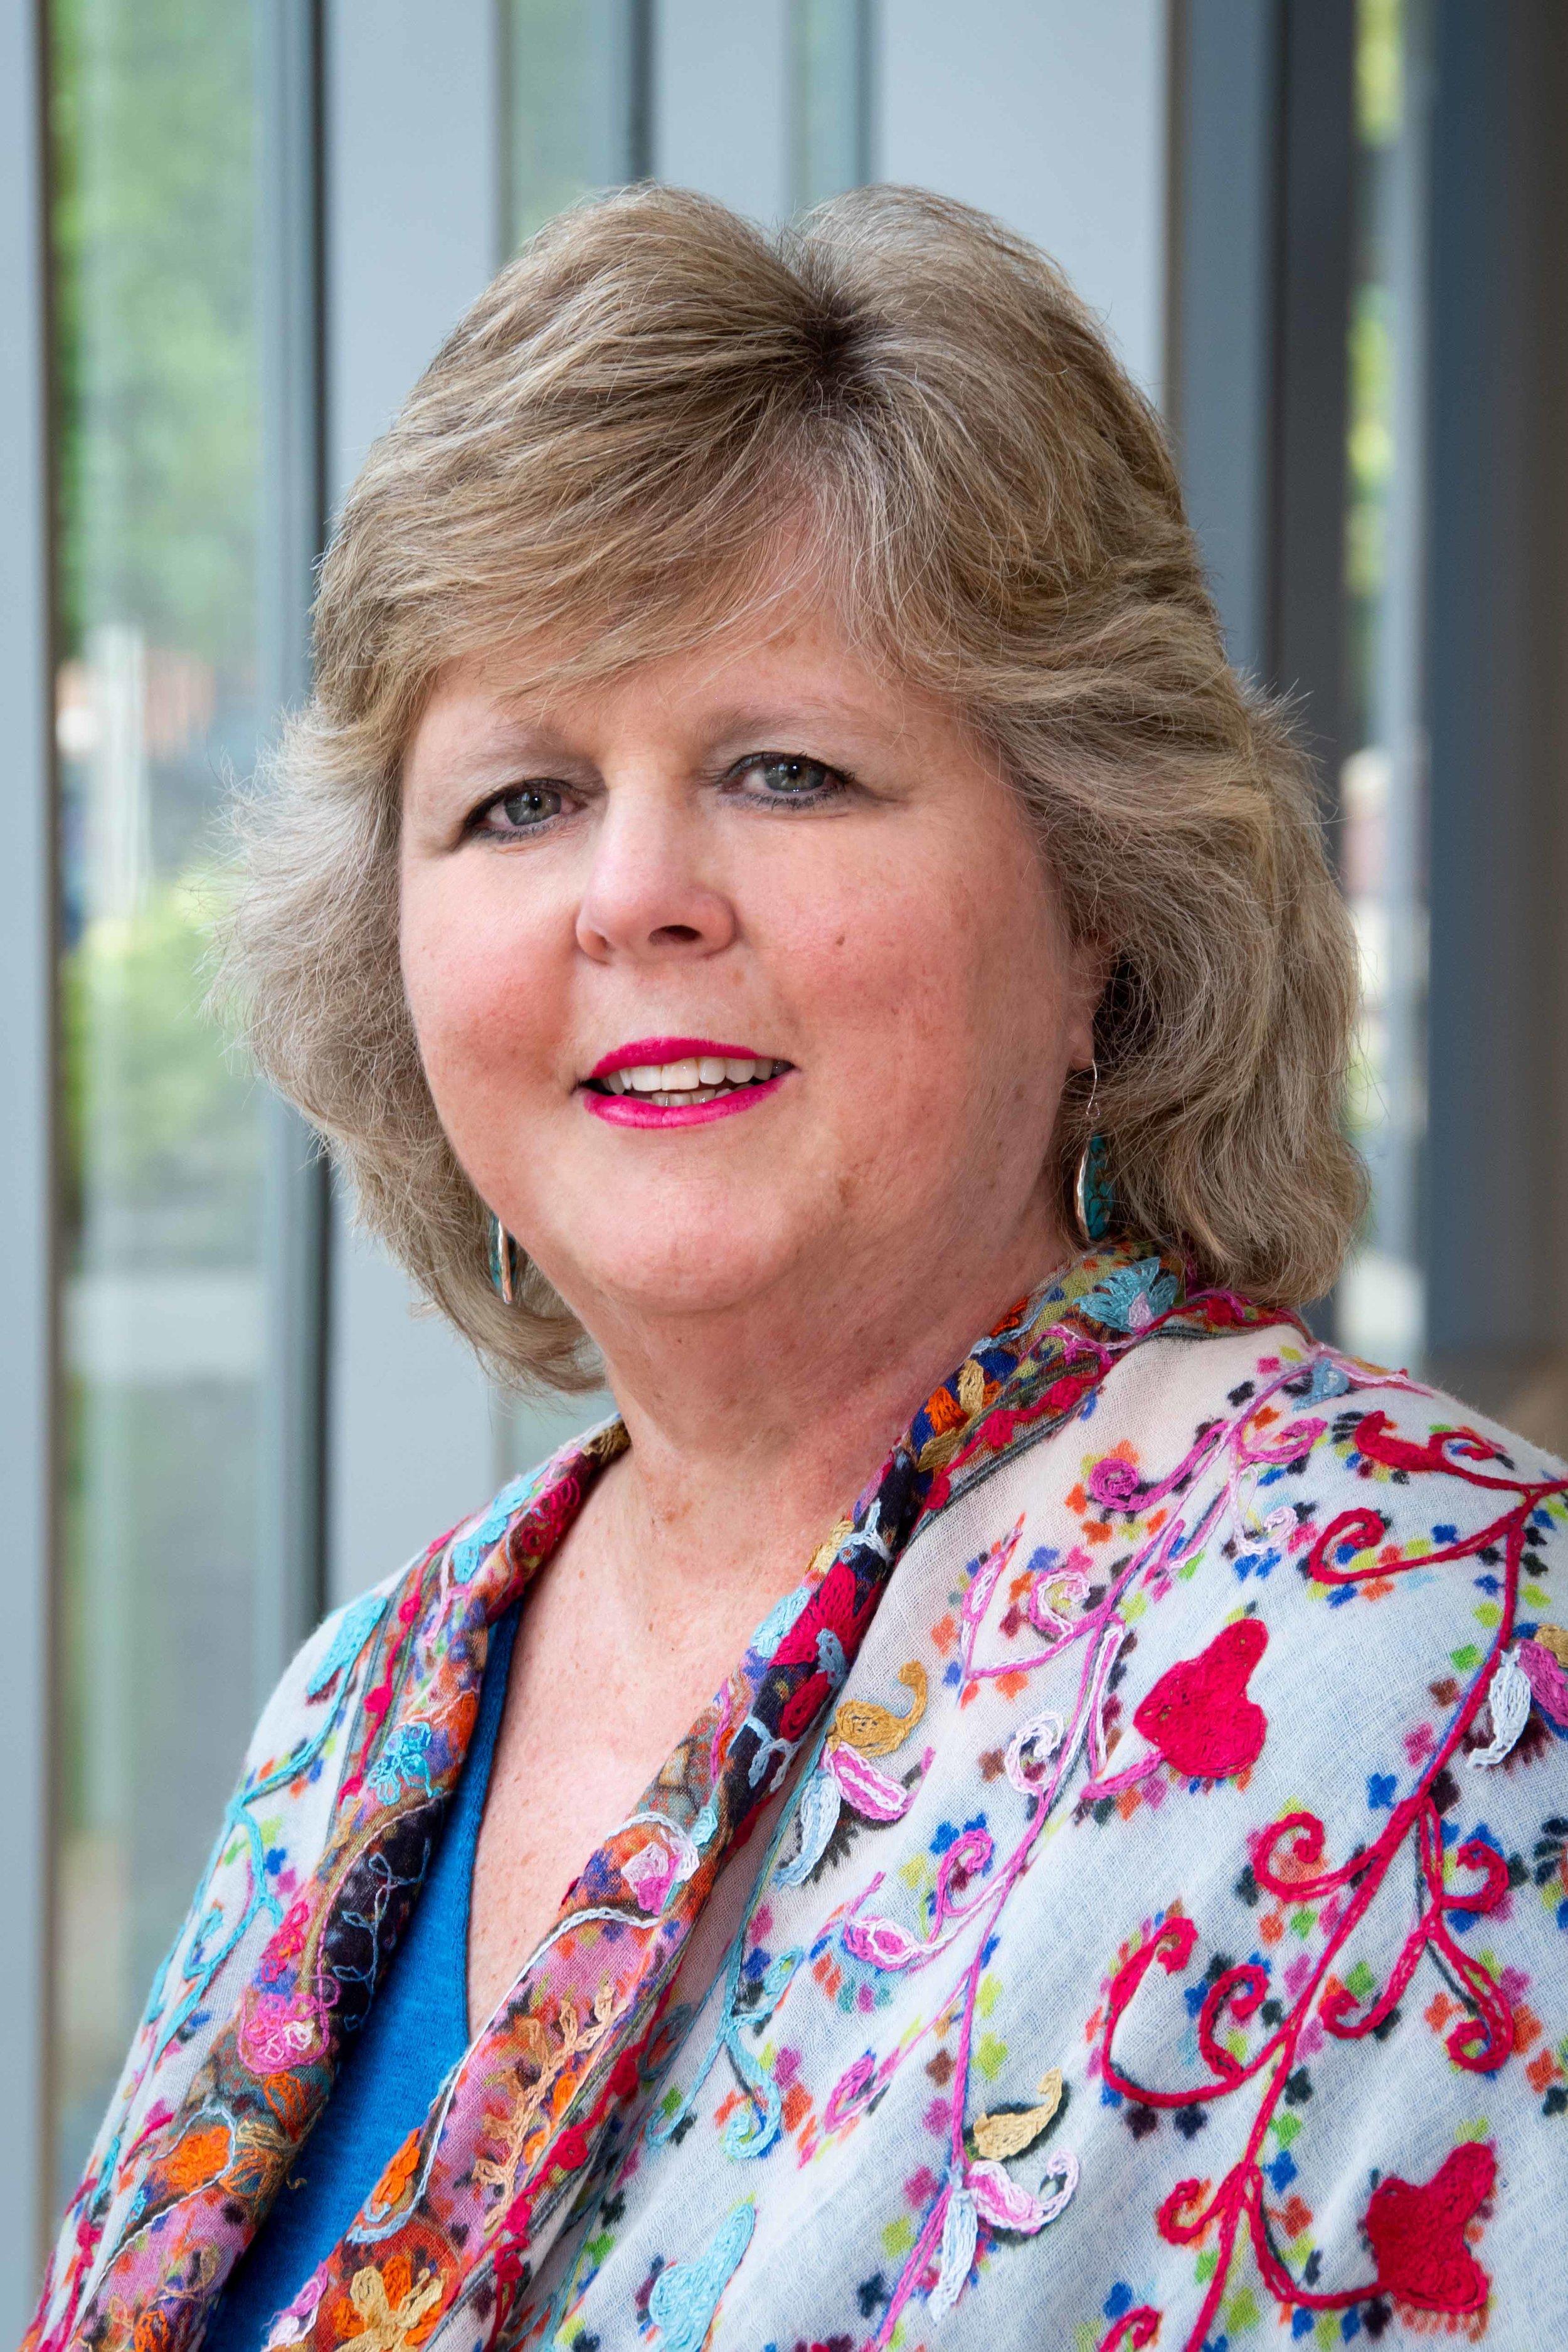 Deborah Vesy <br/> President <br/> Deaconess Foundation